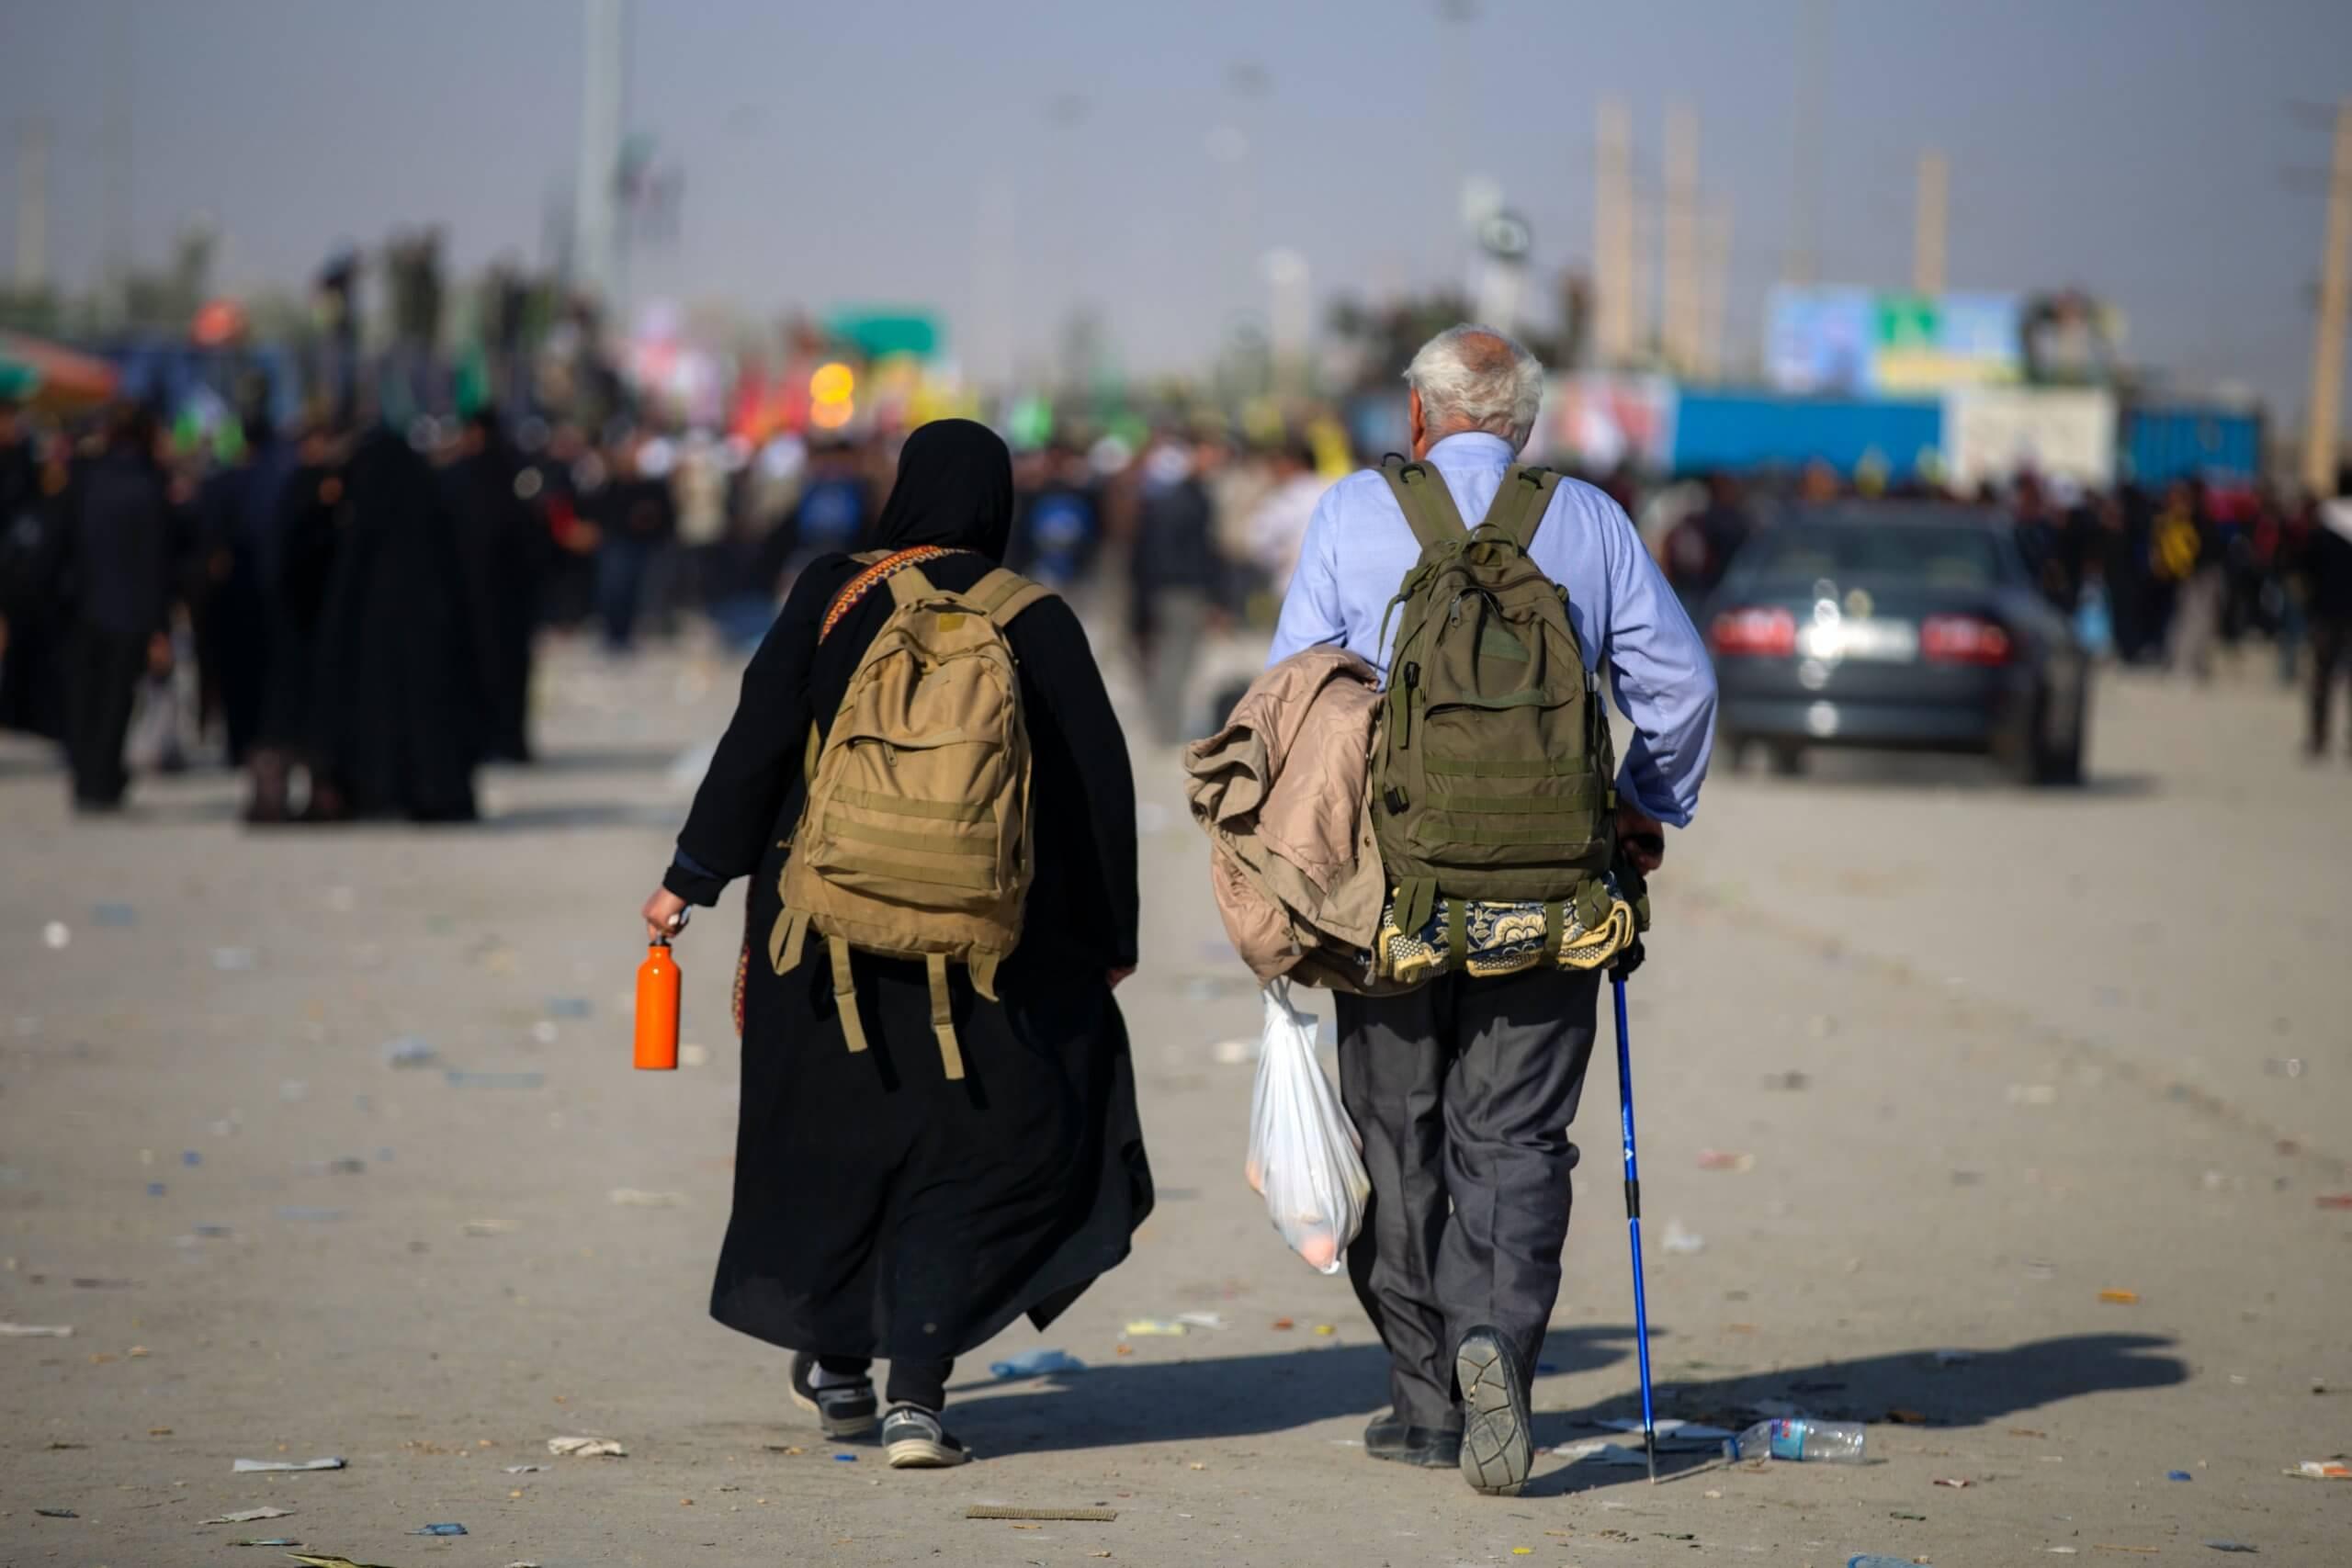 Two older people walk away from the camera. Photo by mostafa meraji on Unsplash